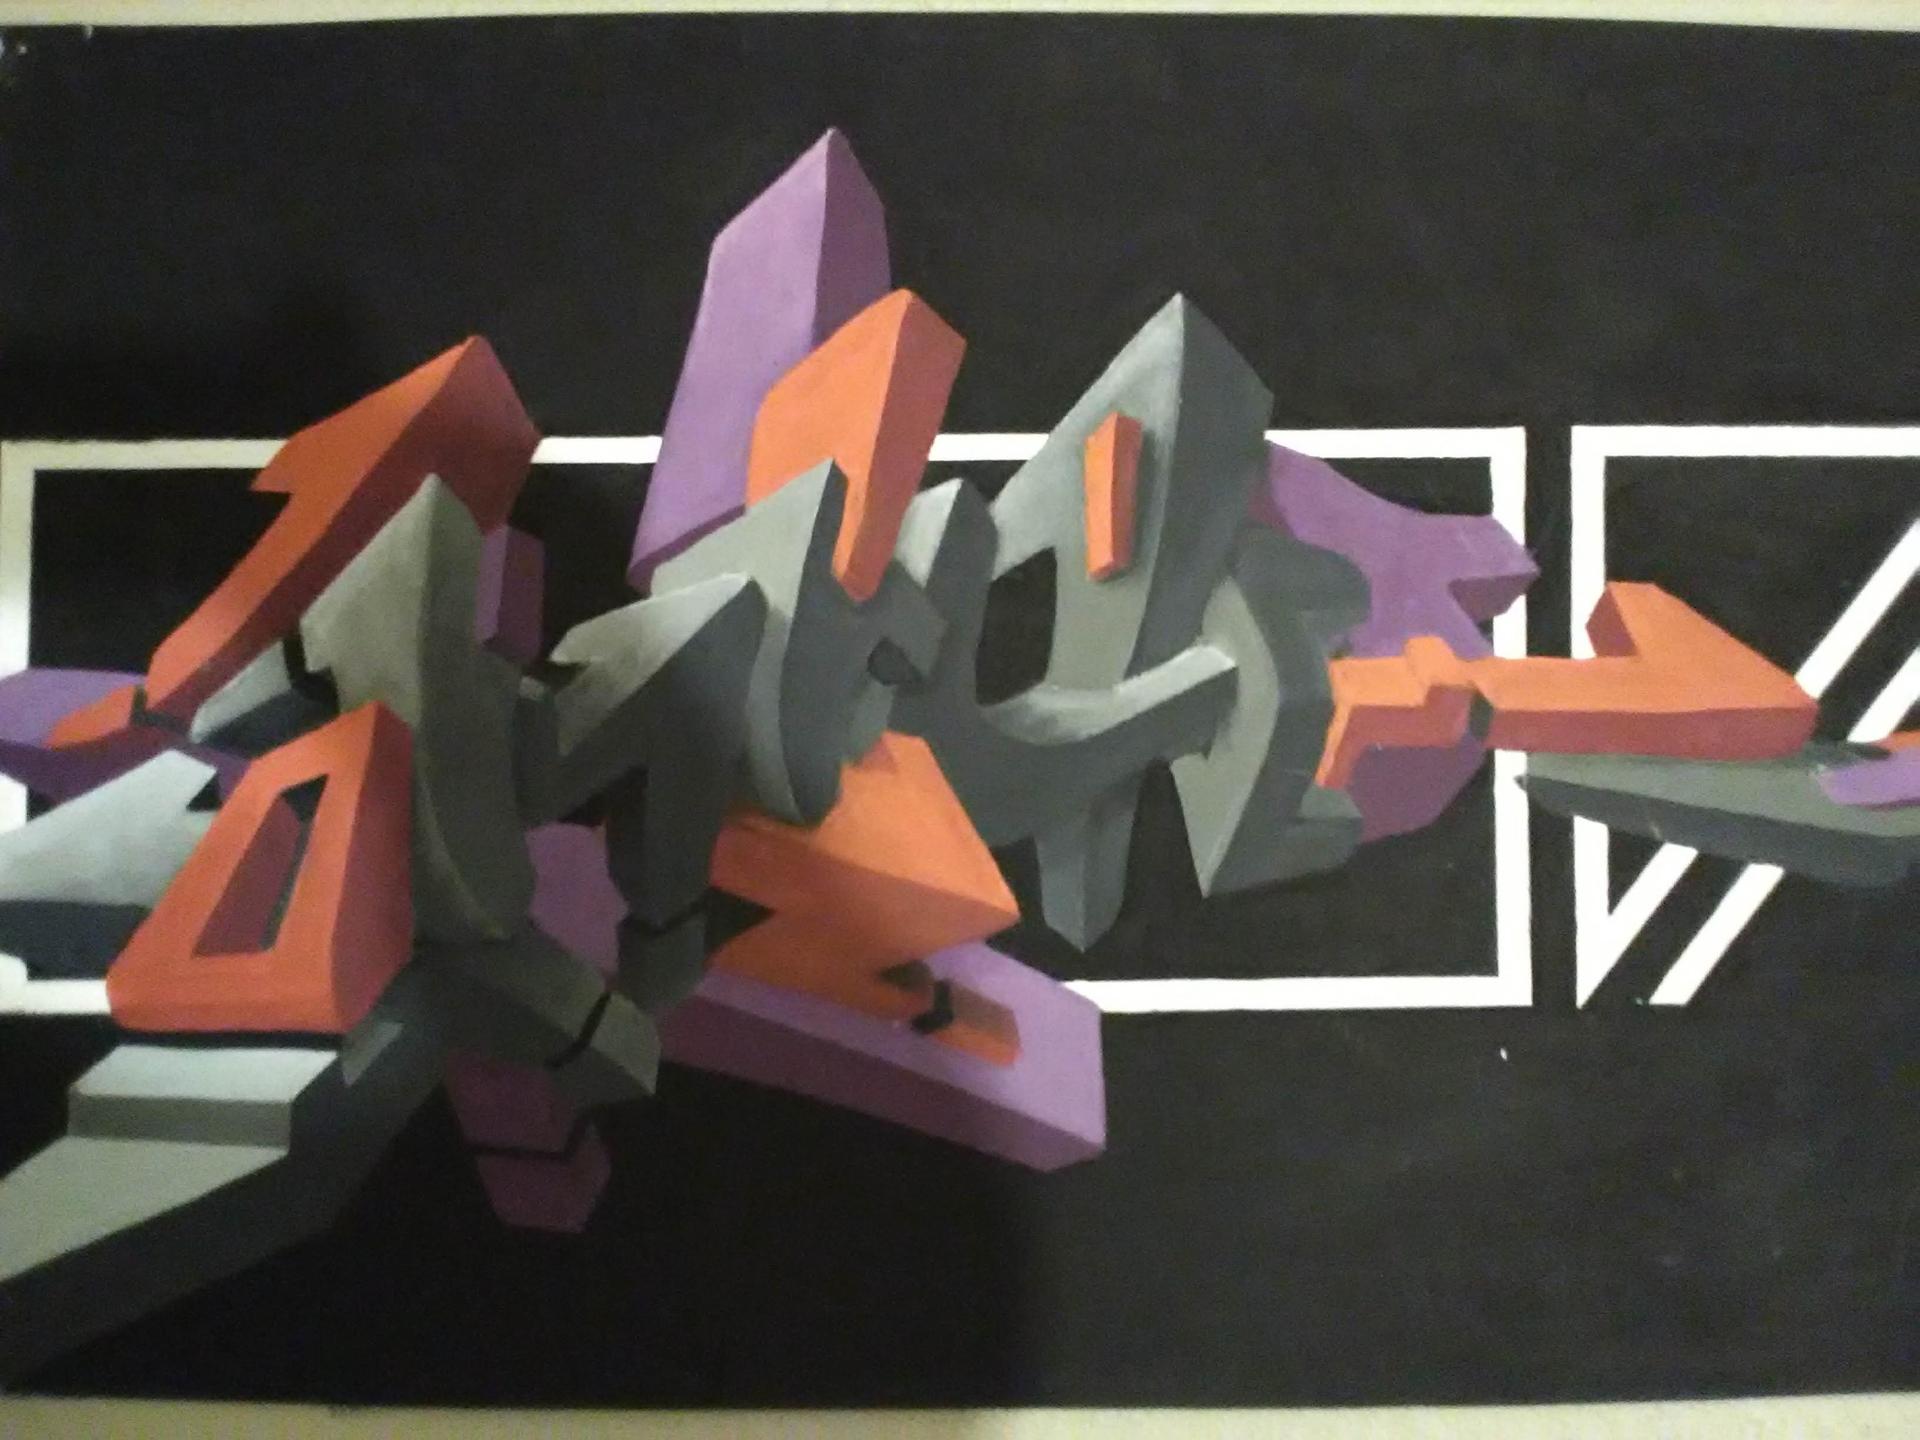 Secti8n, LLC. (@secti8n) Cover Image